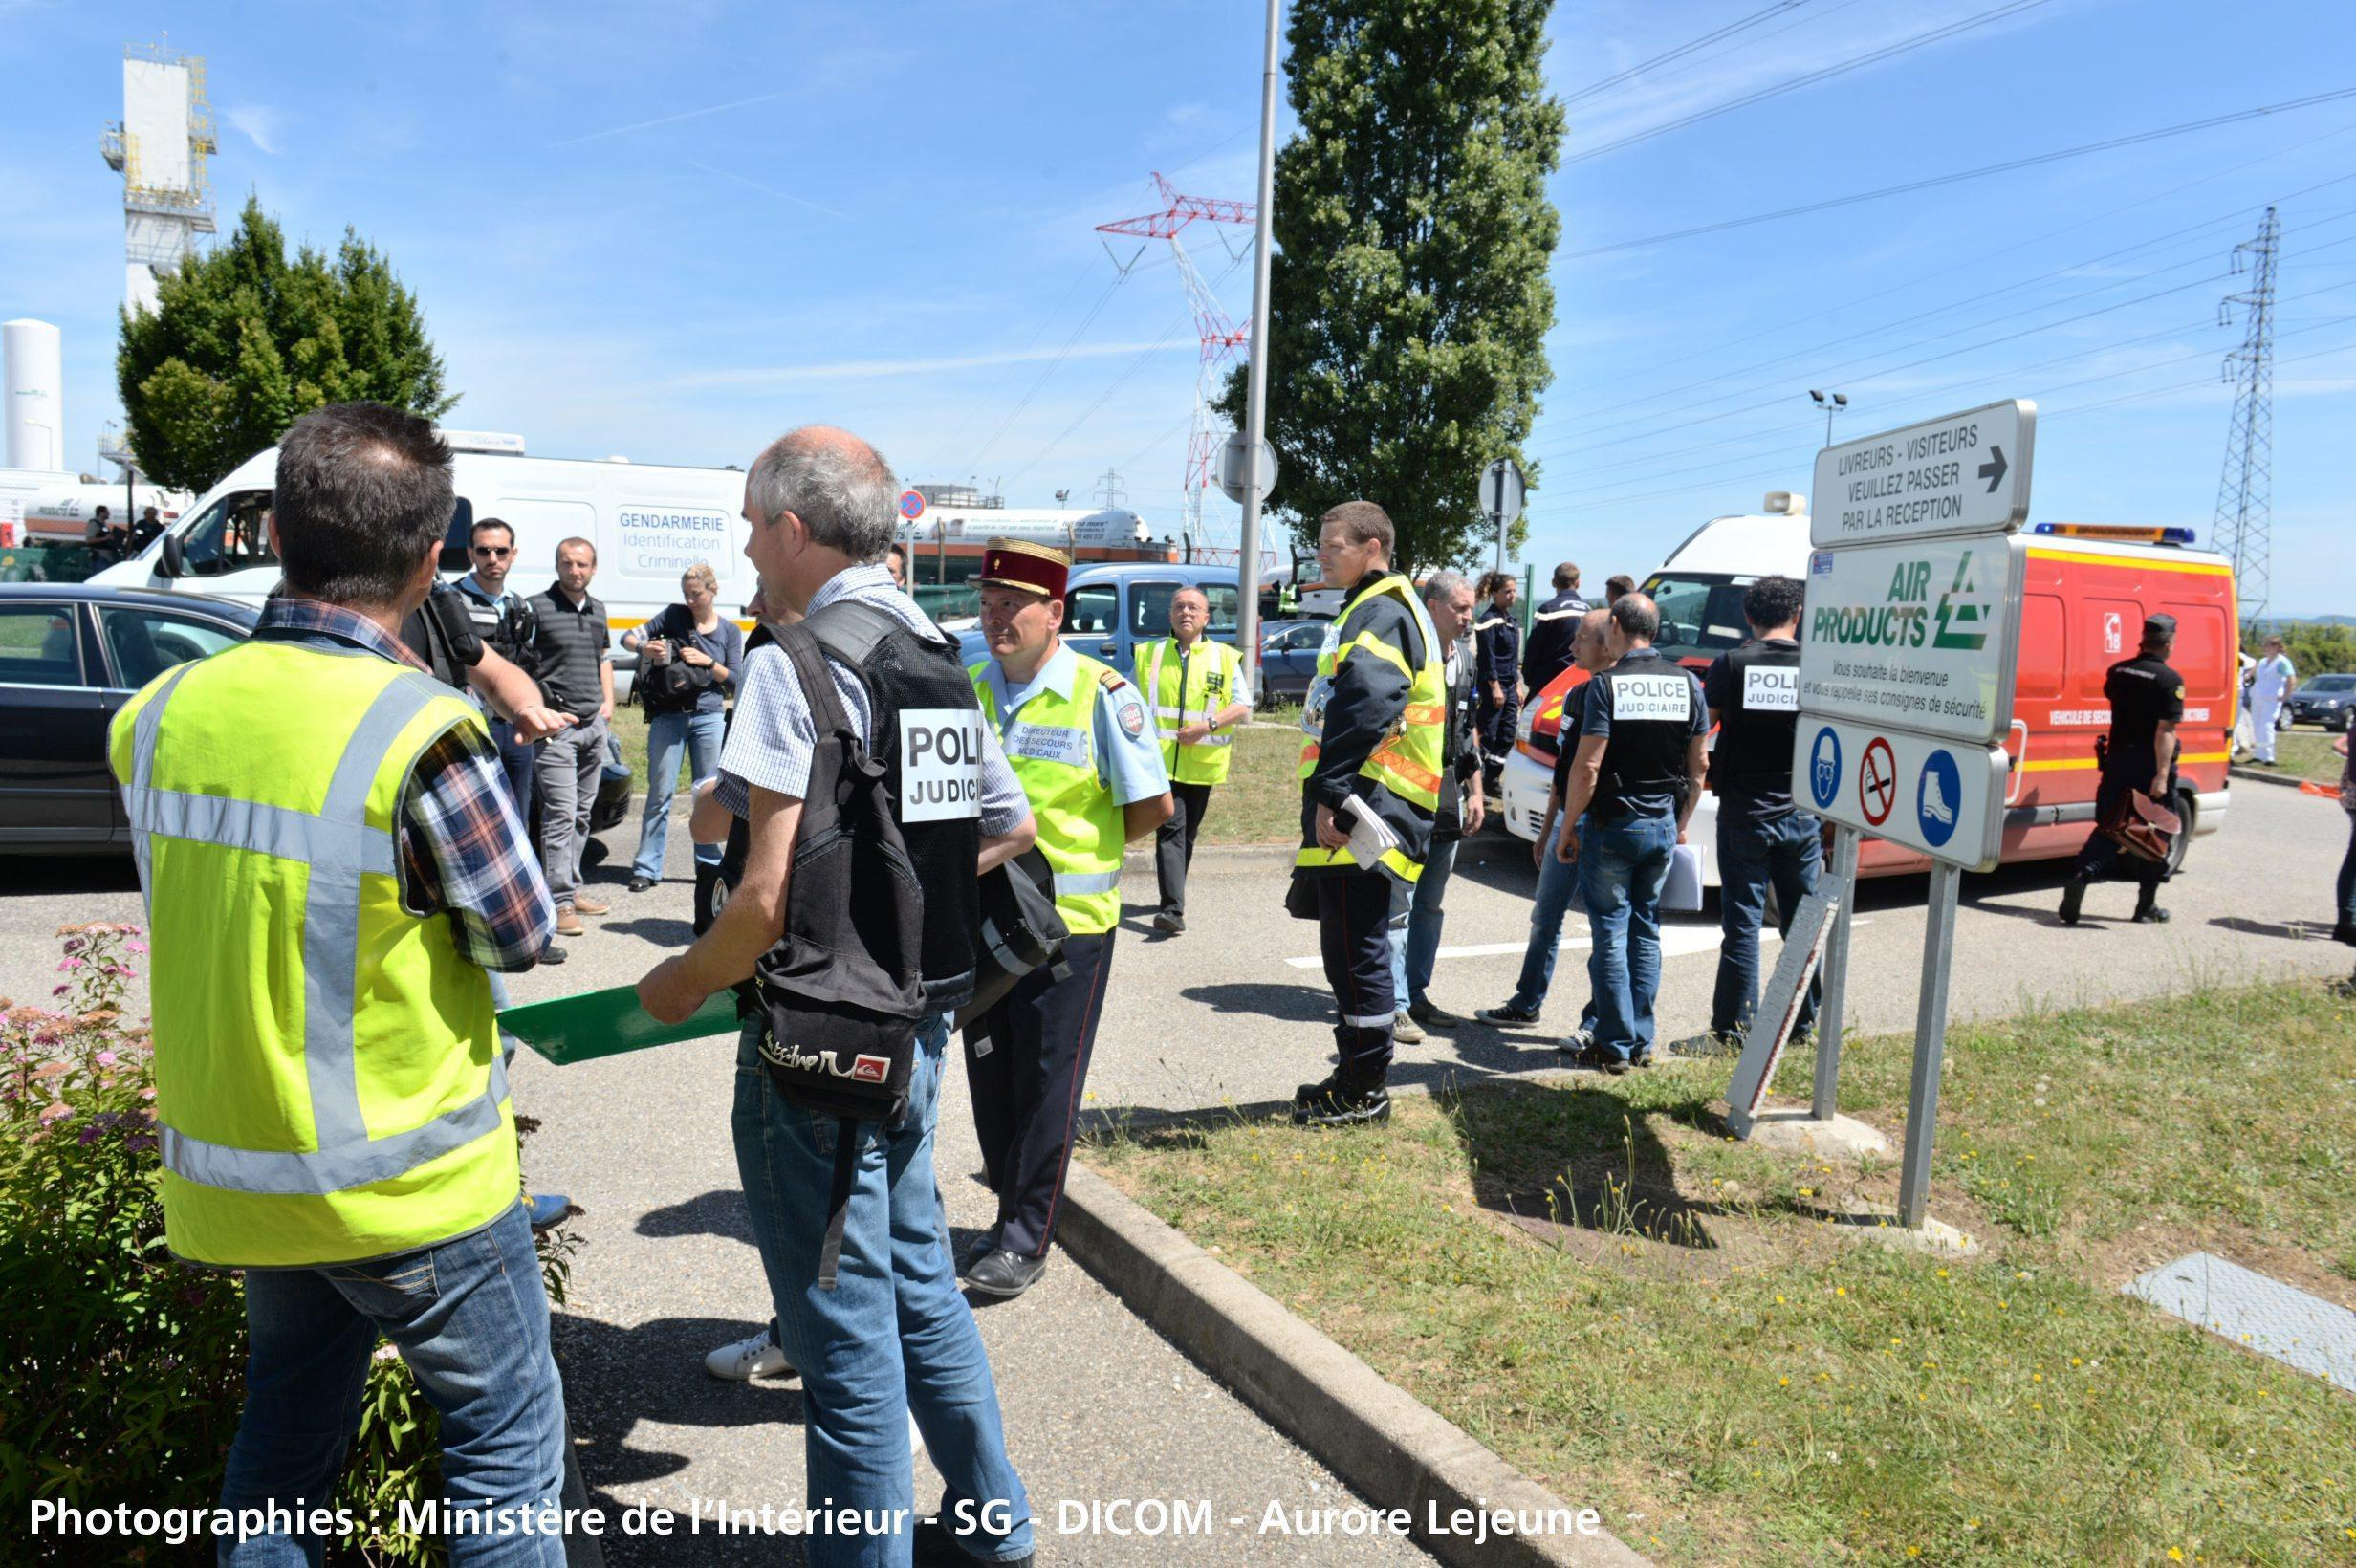 Suspected Islamist attack in Saint-Quentin-Fallavier